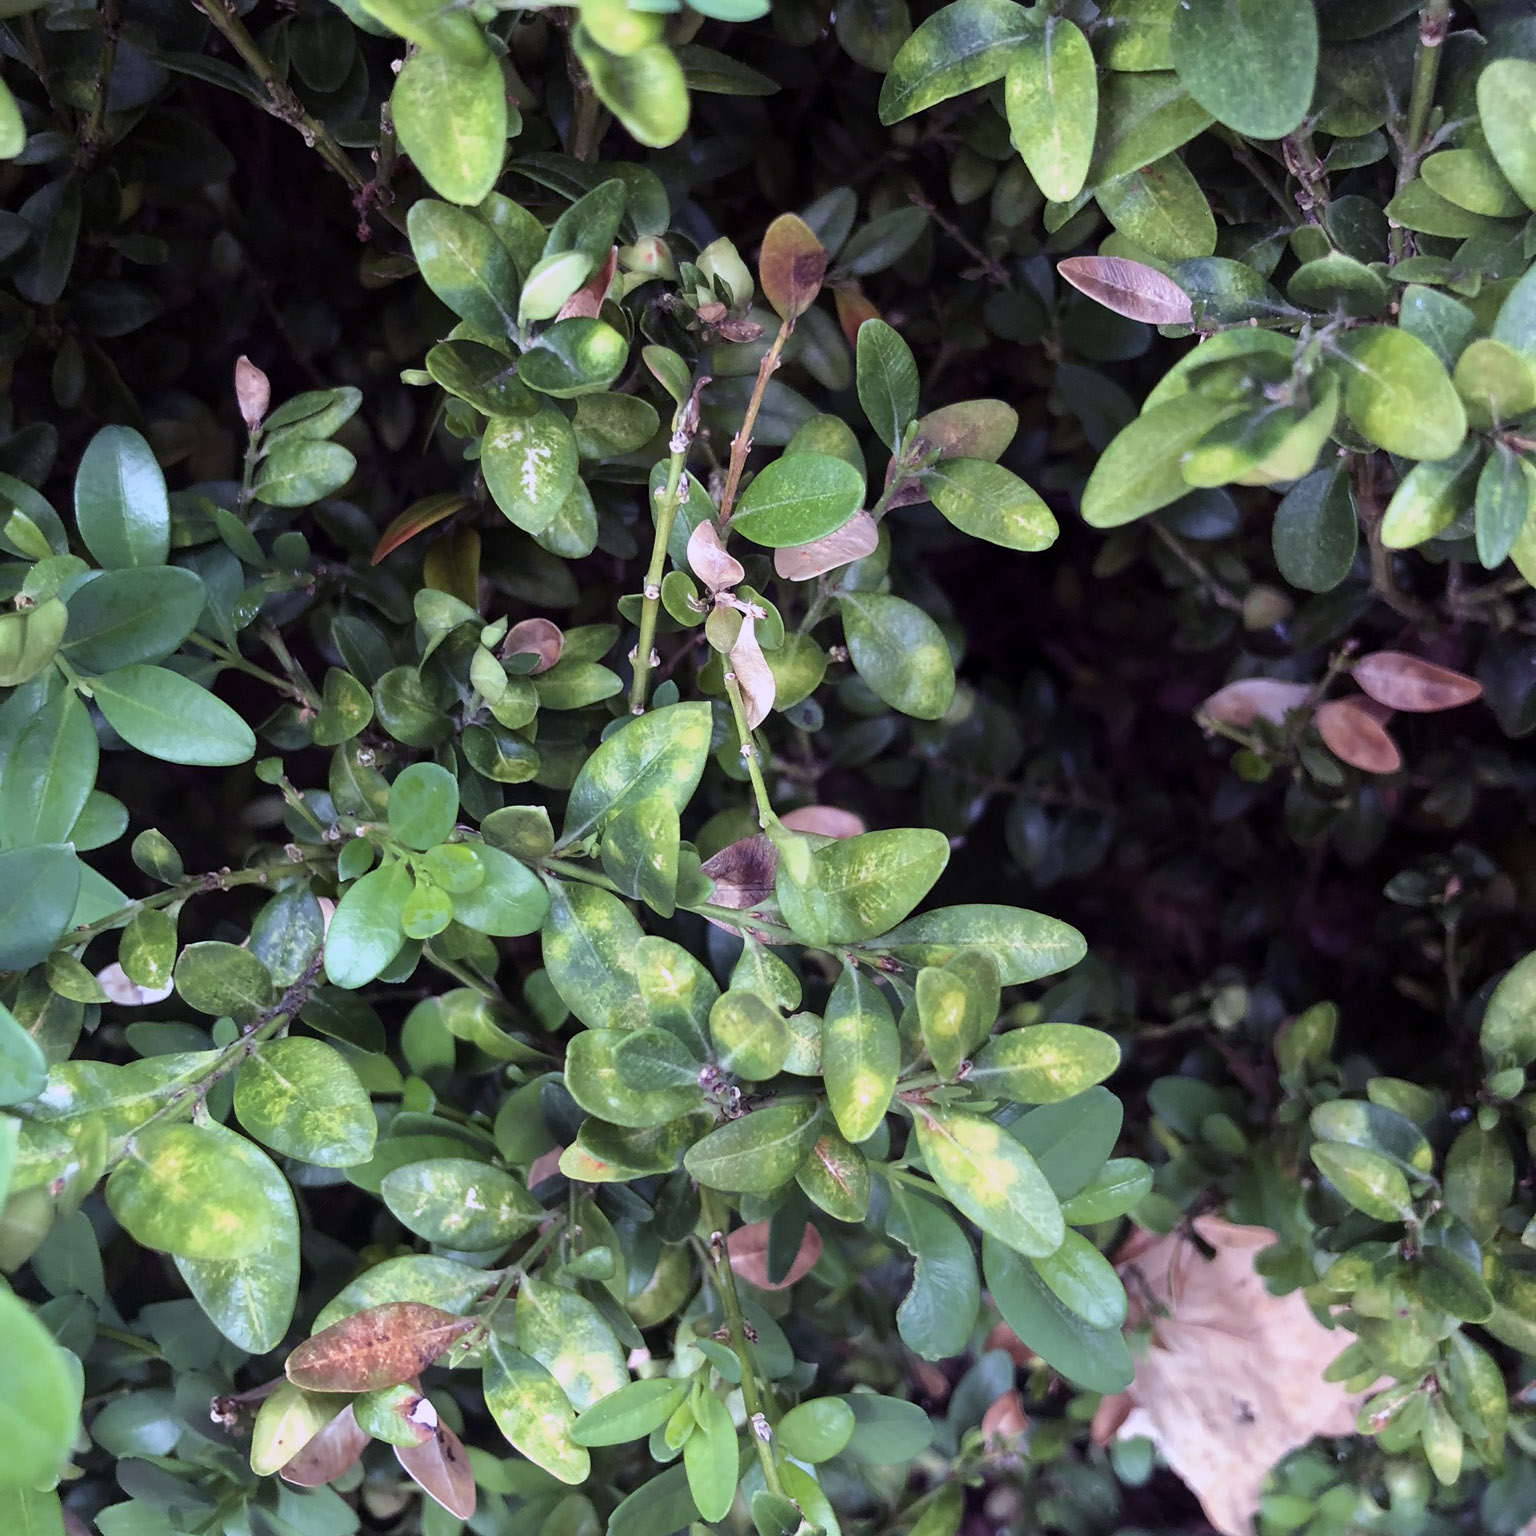 Boxwood leaf miner damage on new plant growth.